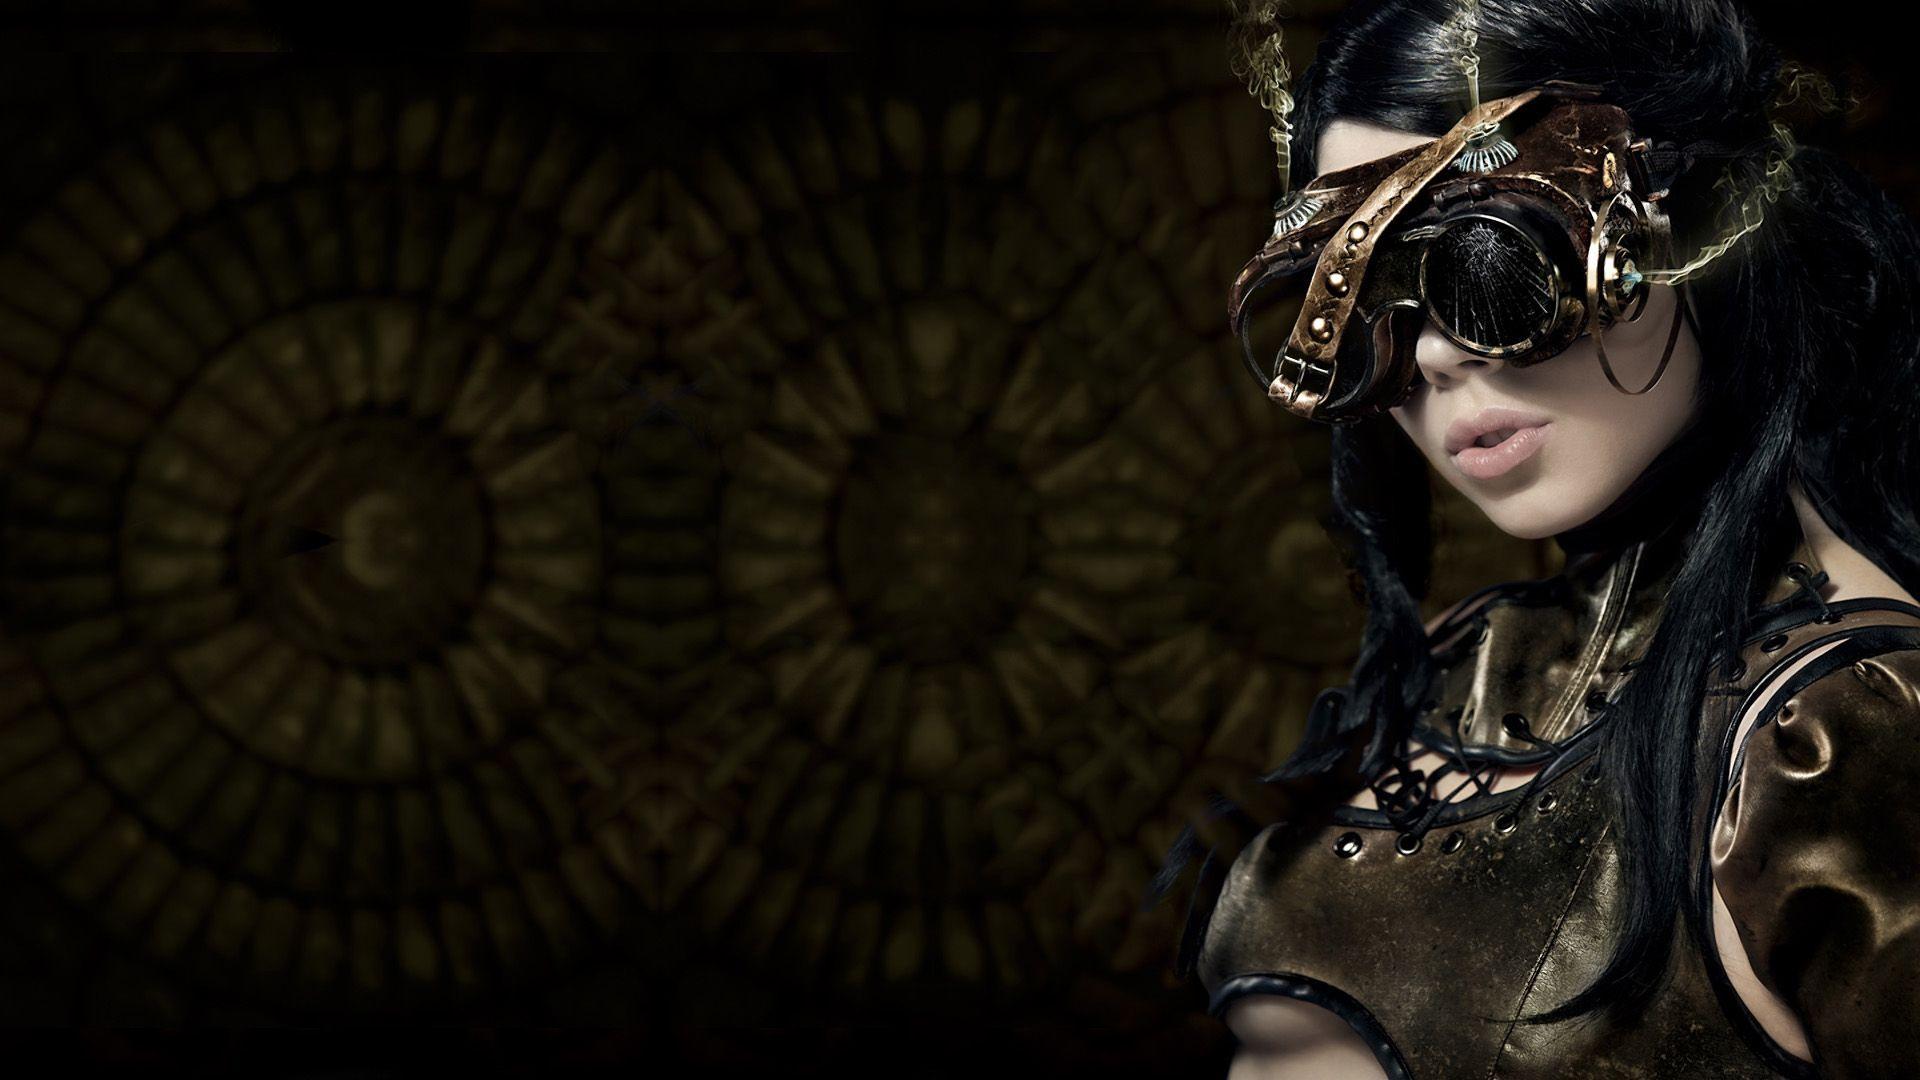 steampunk girl hd wallpaper x